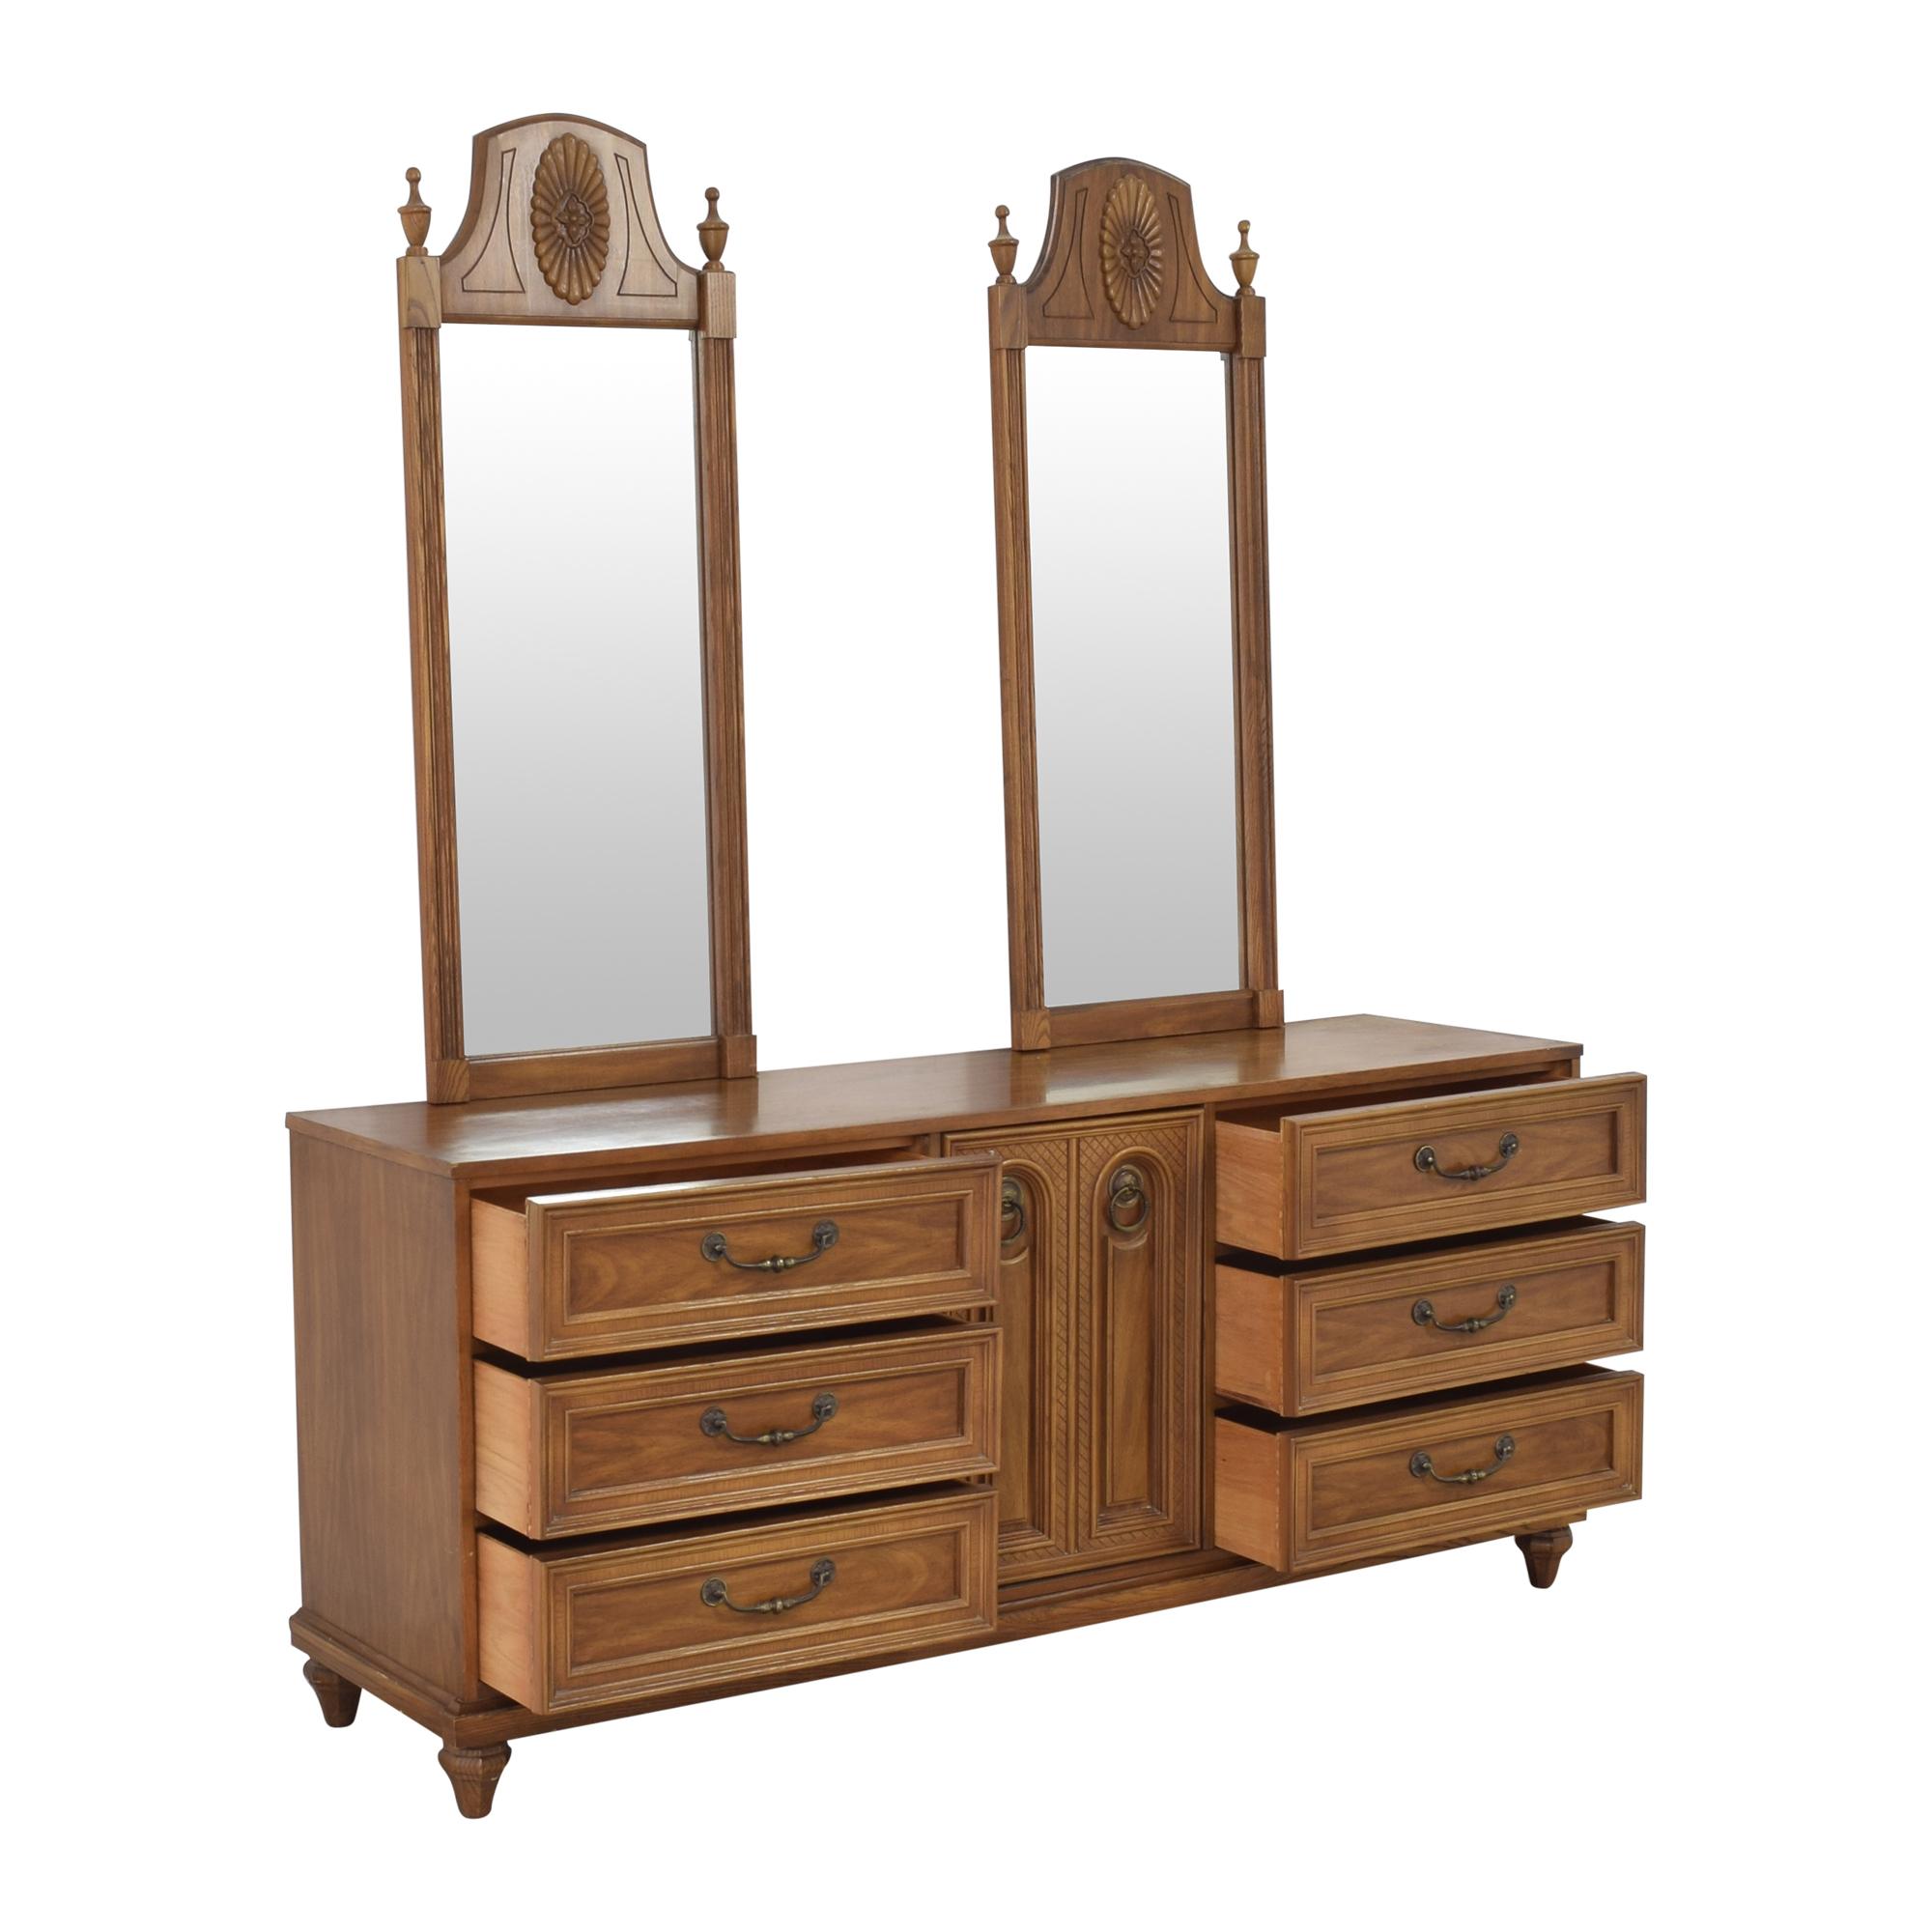 shop Bassett Furniture Cortese Triple Dresser with Mirrors Bassett Furniture Storage